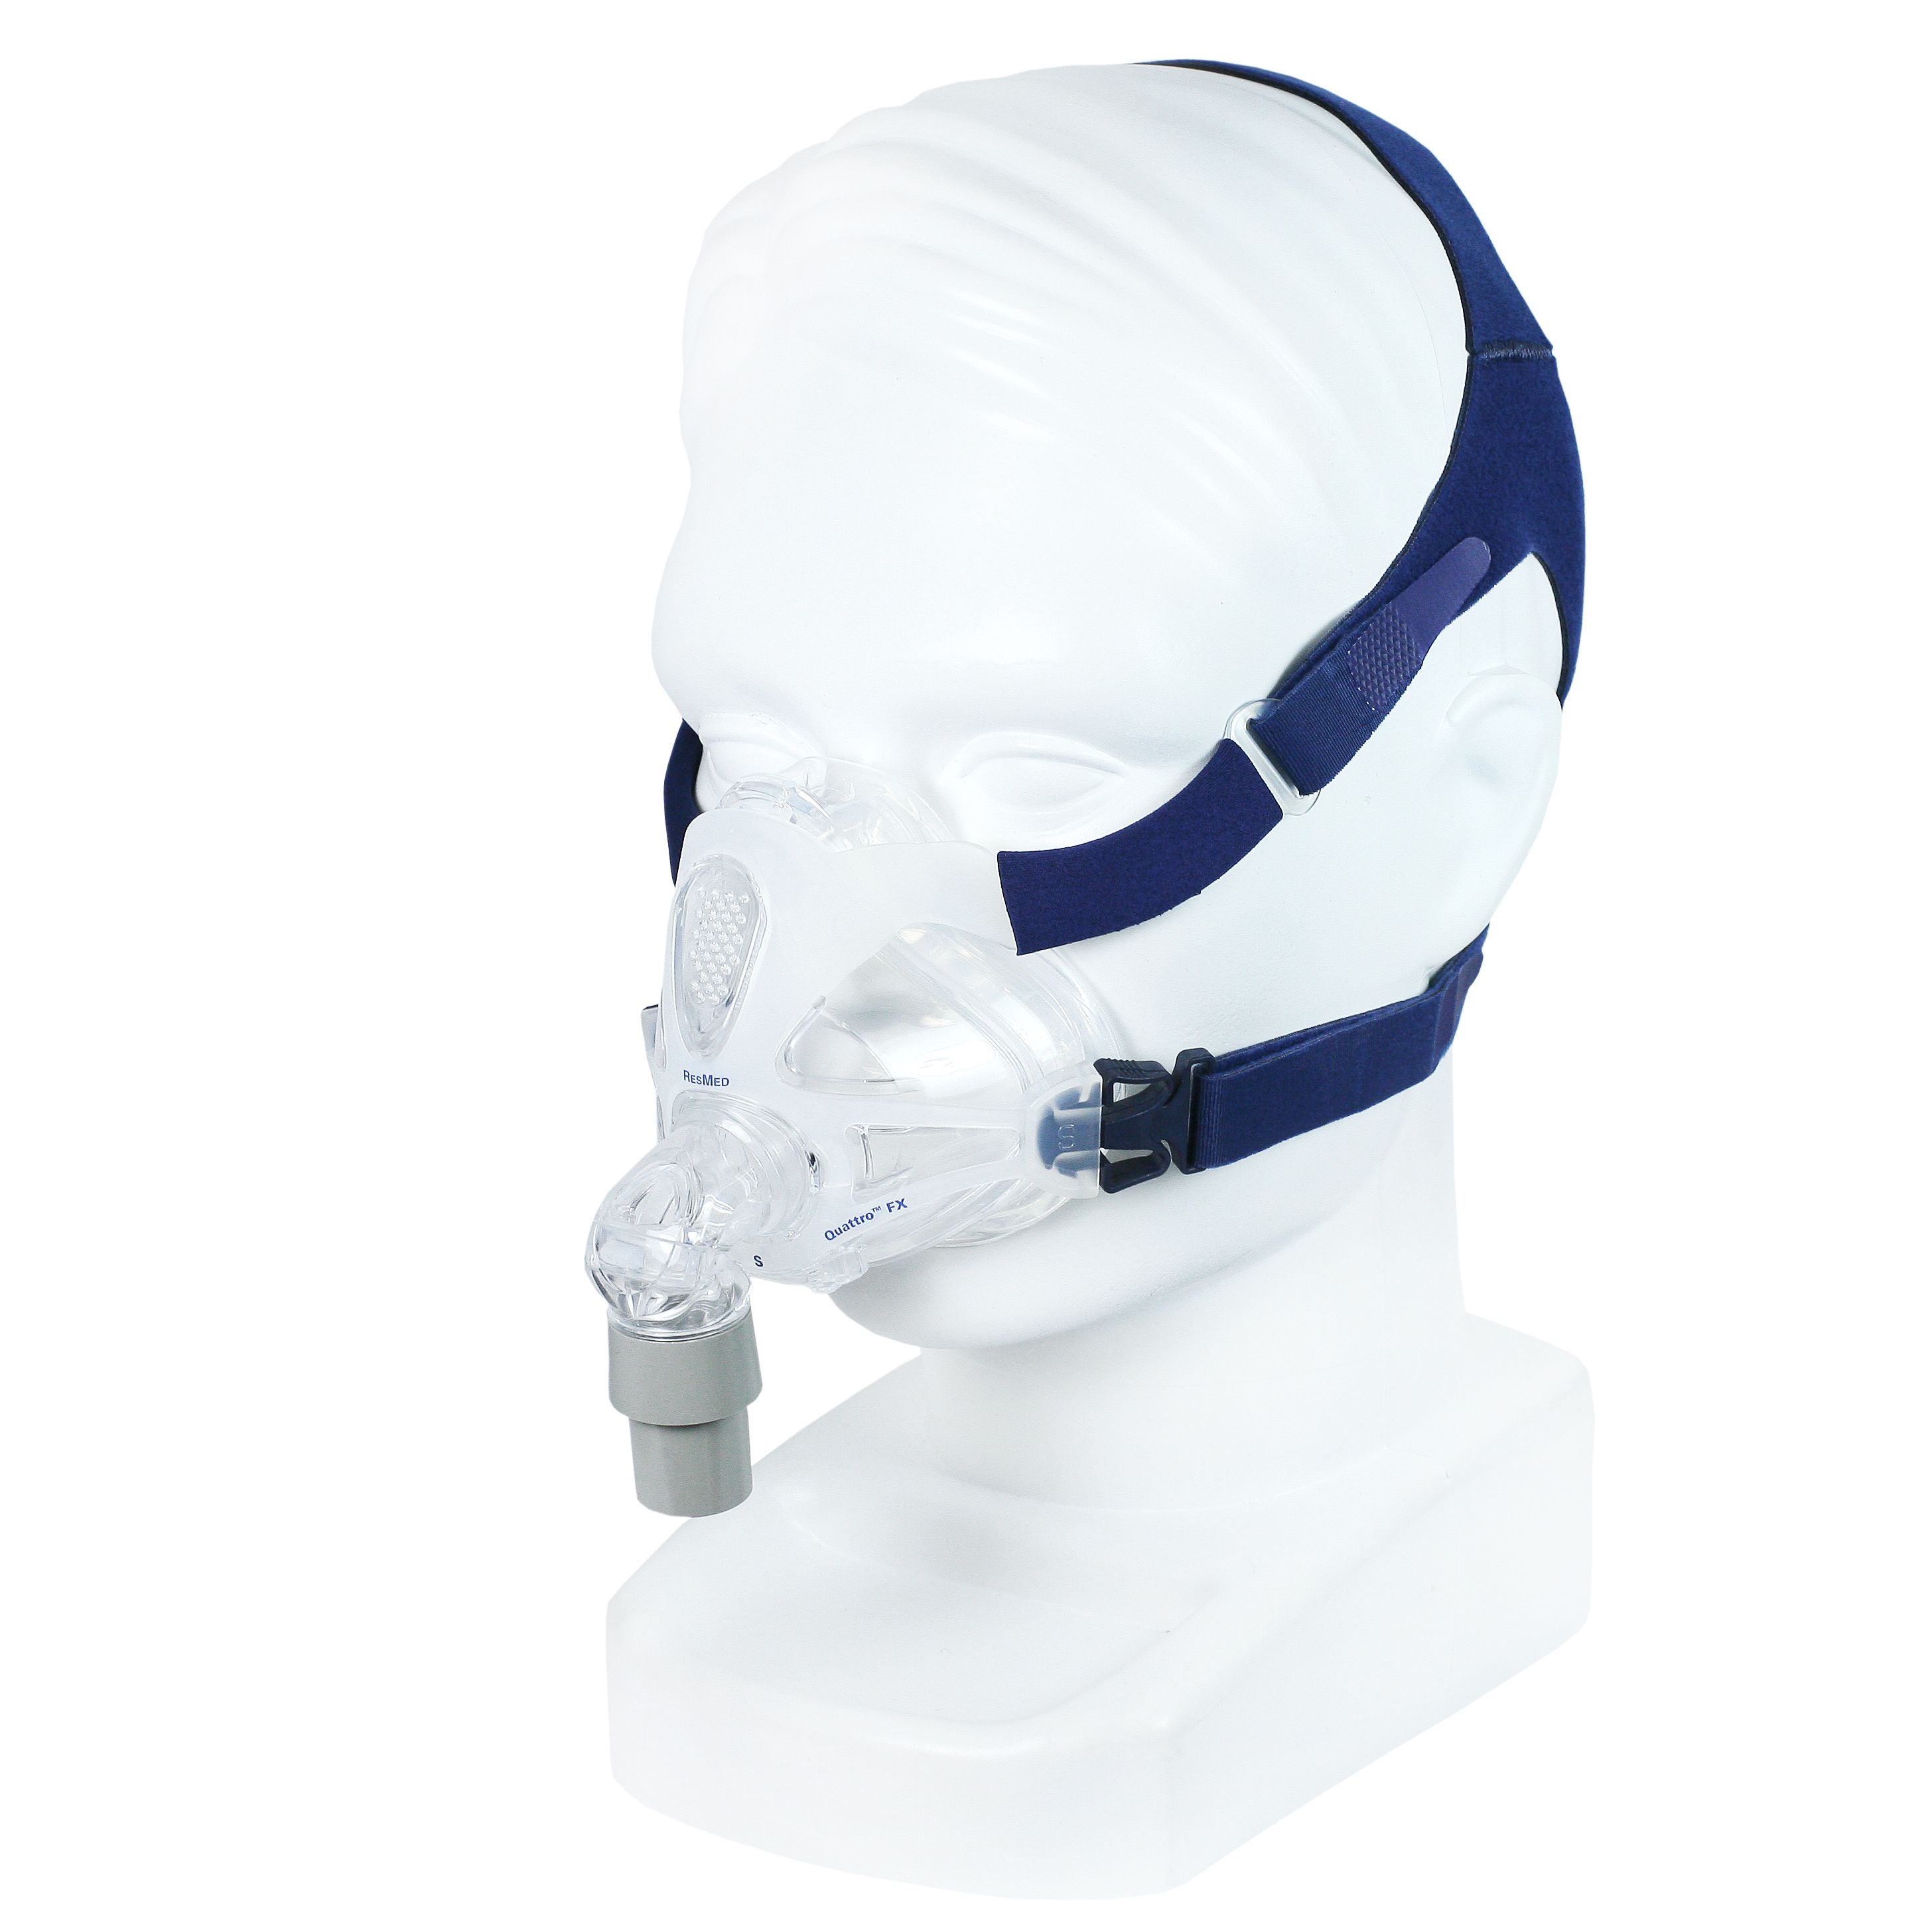 ResMed Quattro FX Full Face Mask w/ Headgear Full face